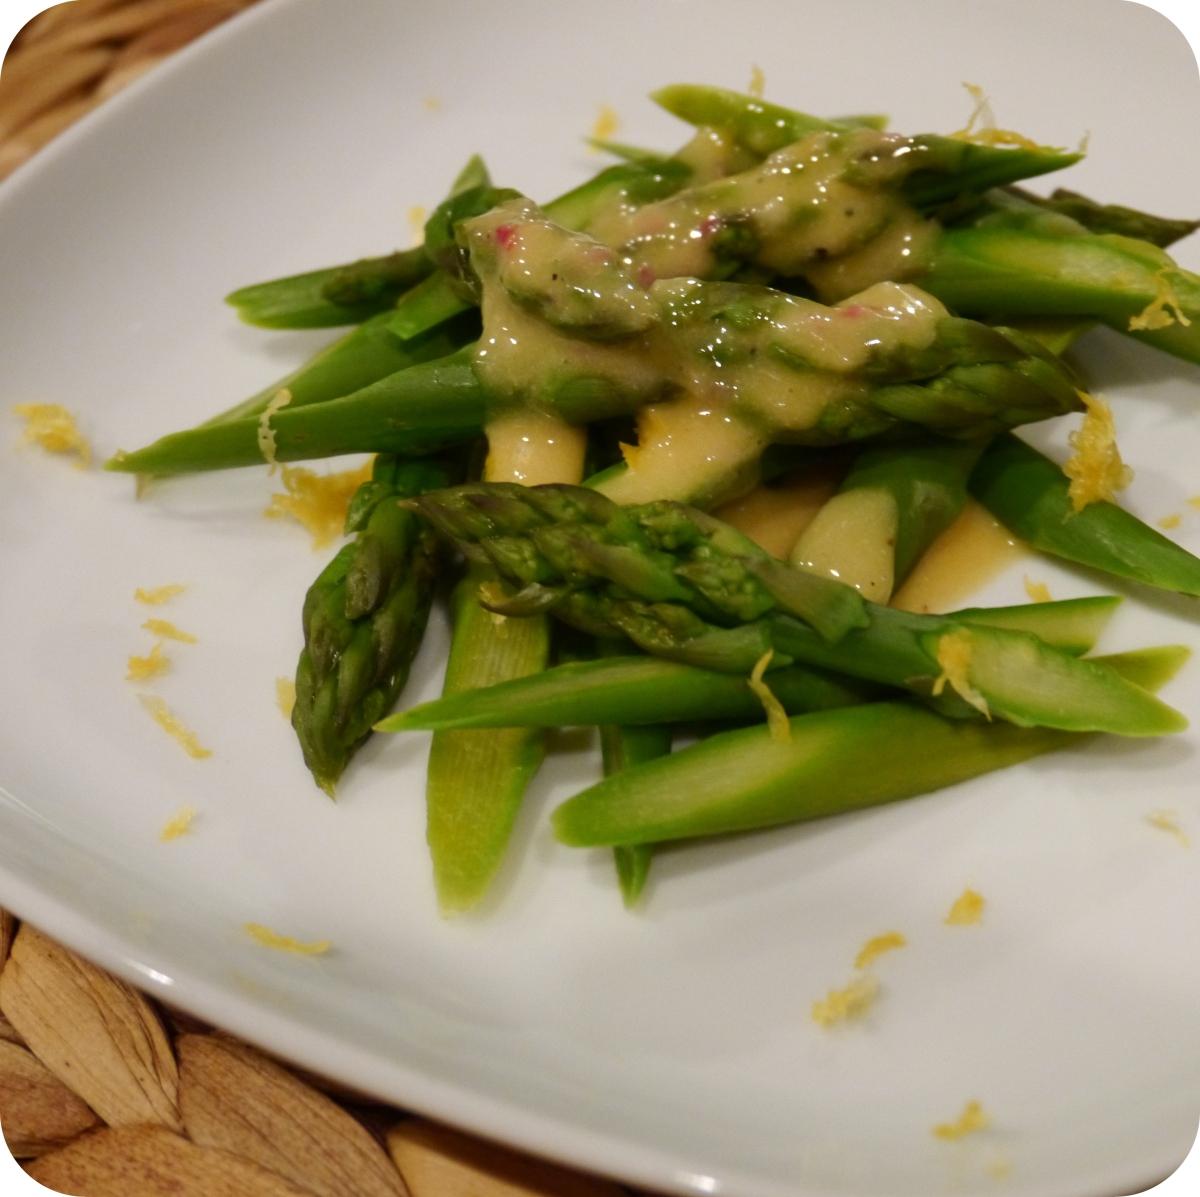 Asparagus with Dijon Shallot Vinaigrette | Fried Tofu